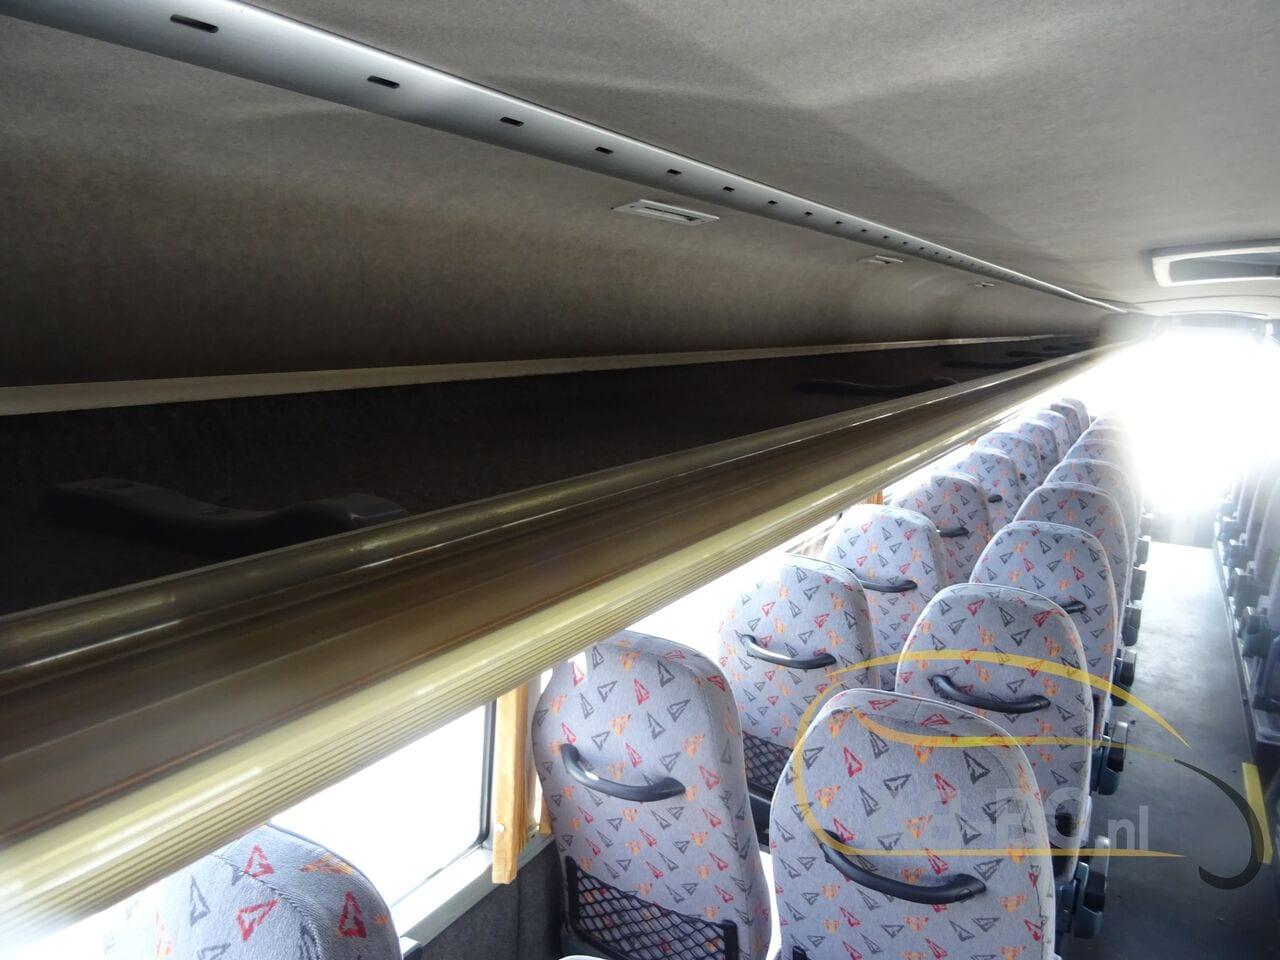 coach-busTEMSA-Safari-RD-DAF-Motor-53-Seats-Euro-5---1623932589384004099_big_d1cacebad79b4f4608e59adcdff87bf0--21061715155620919600